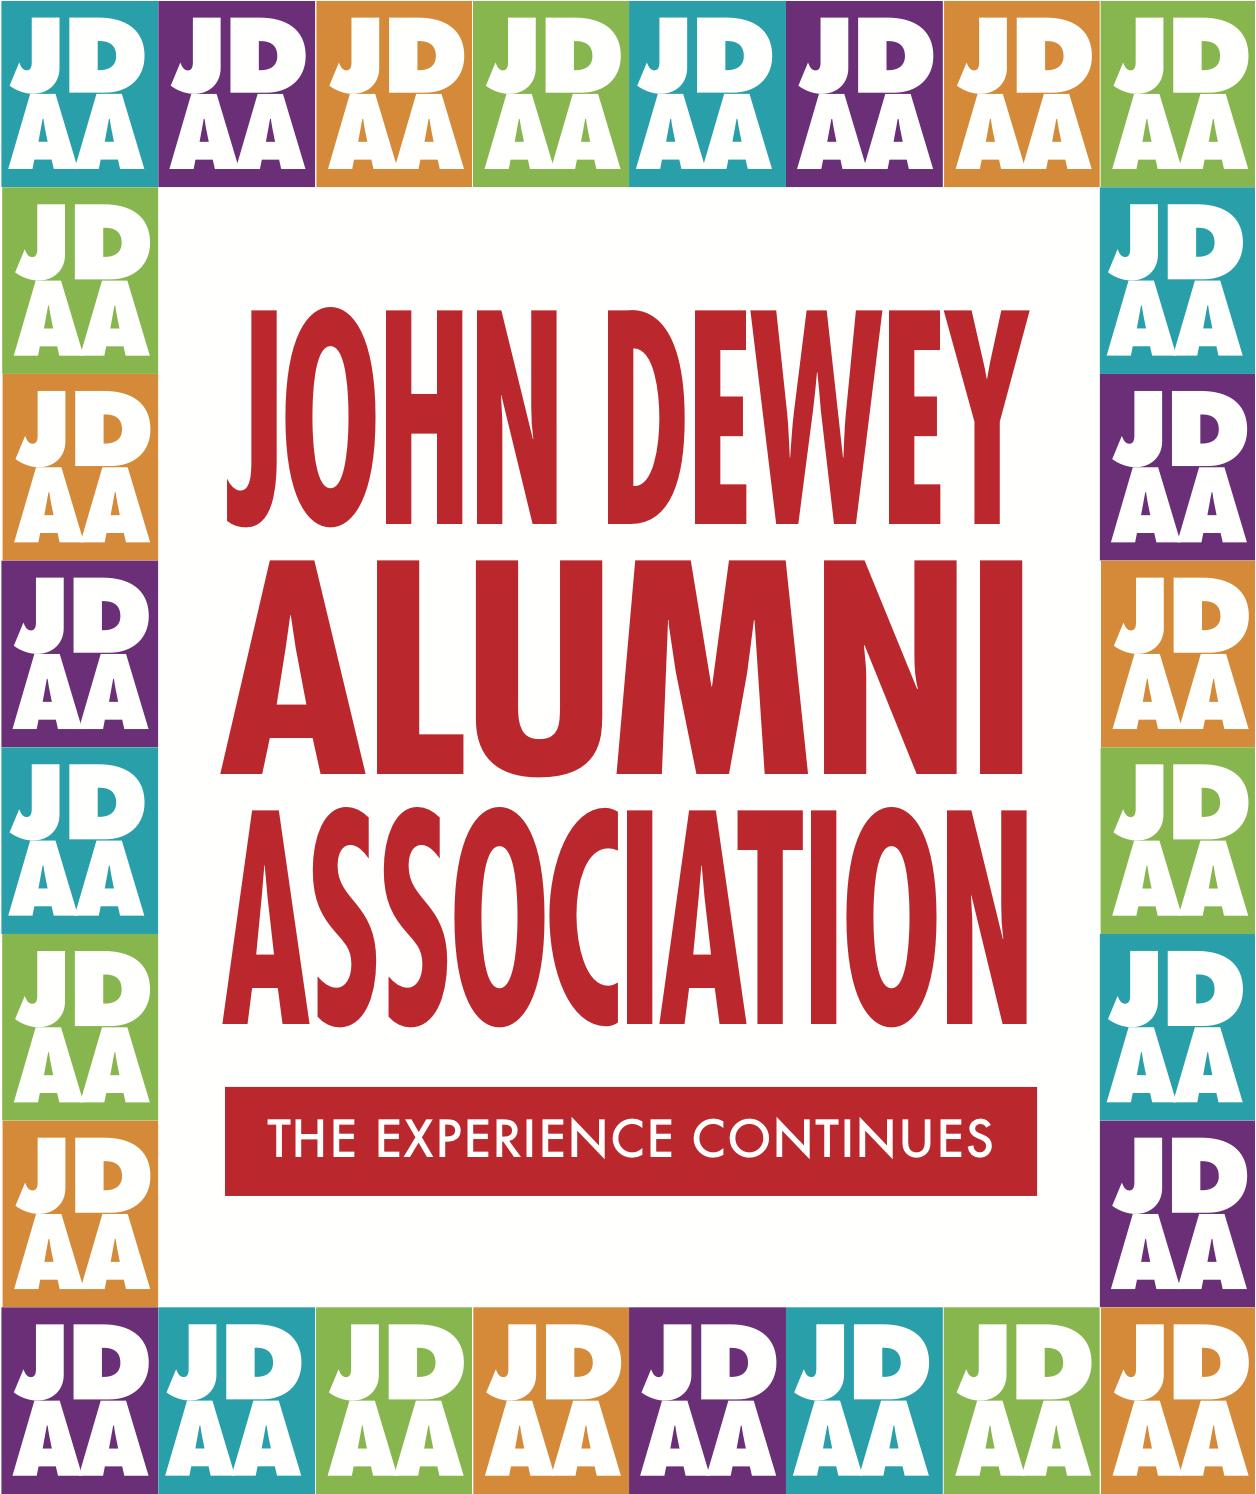 The John Dewey Alumni Association Logo